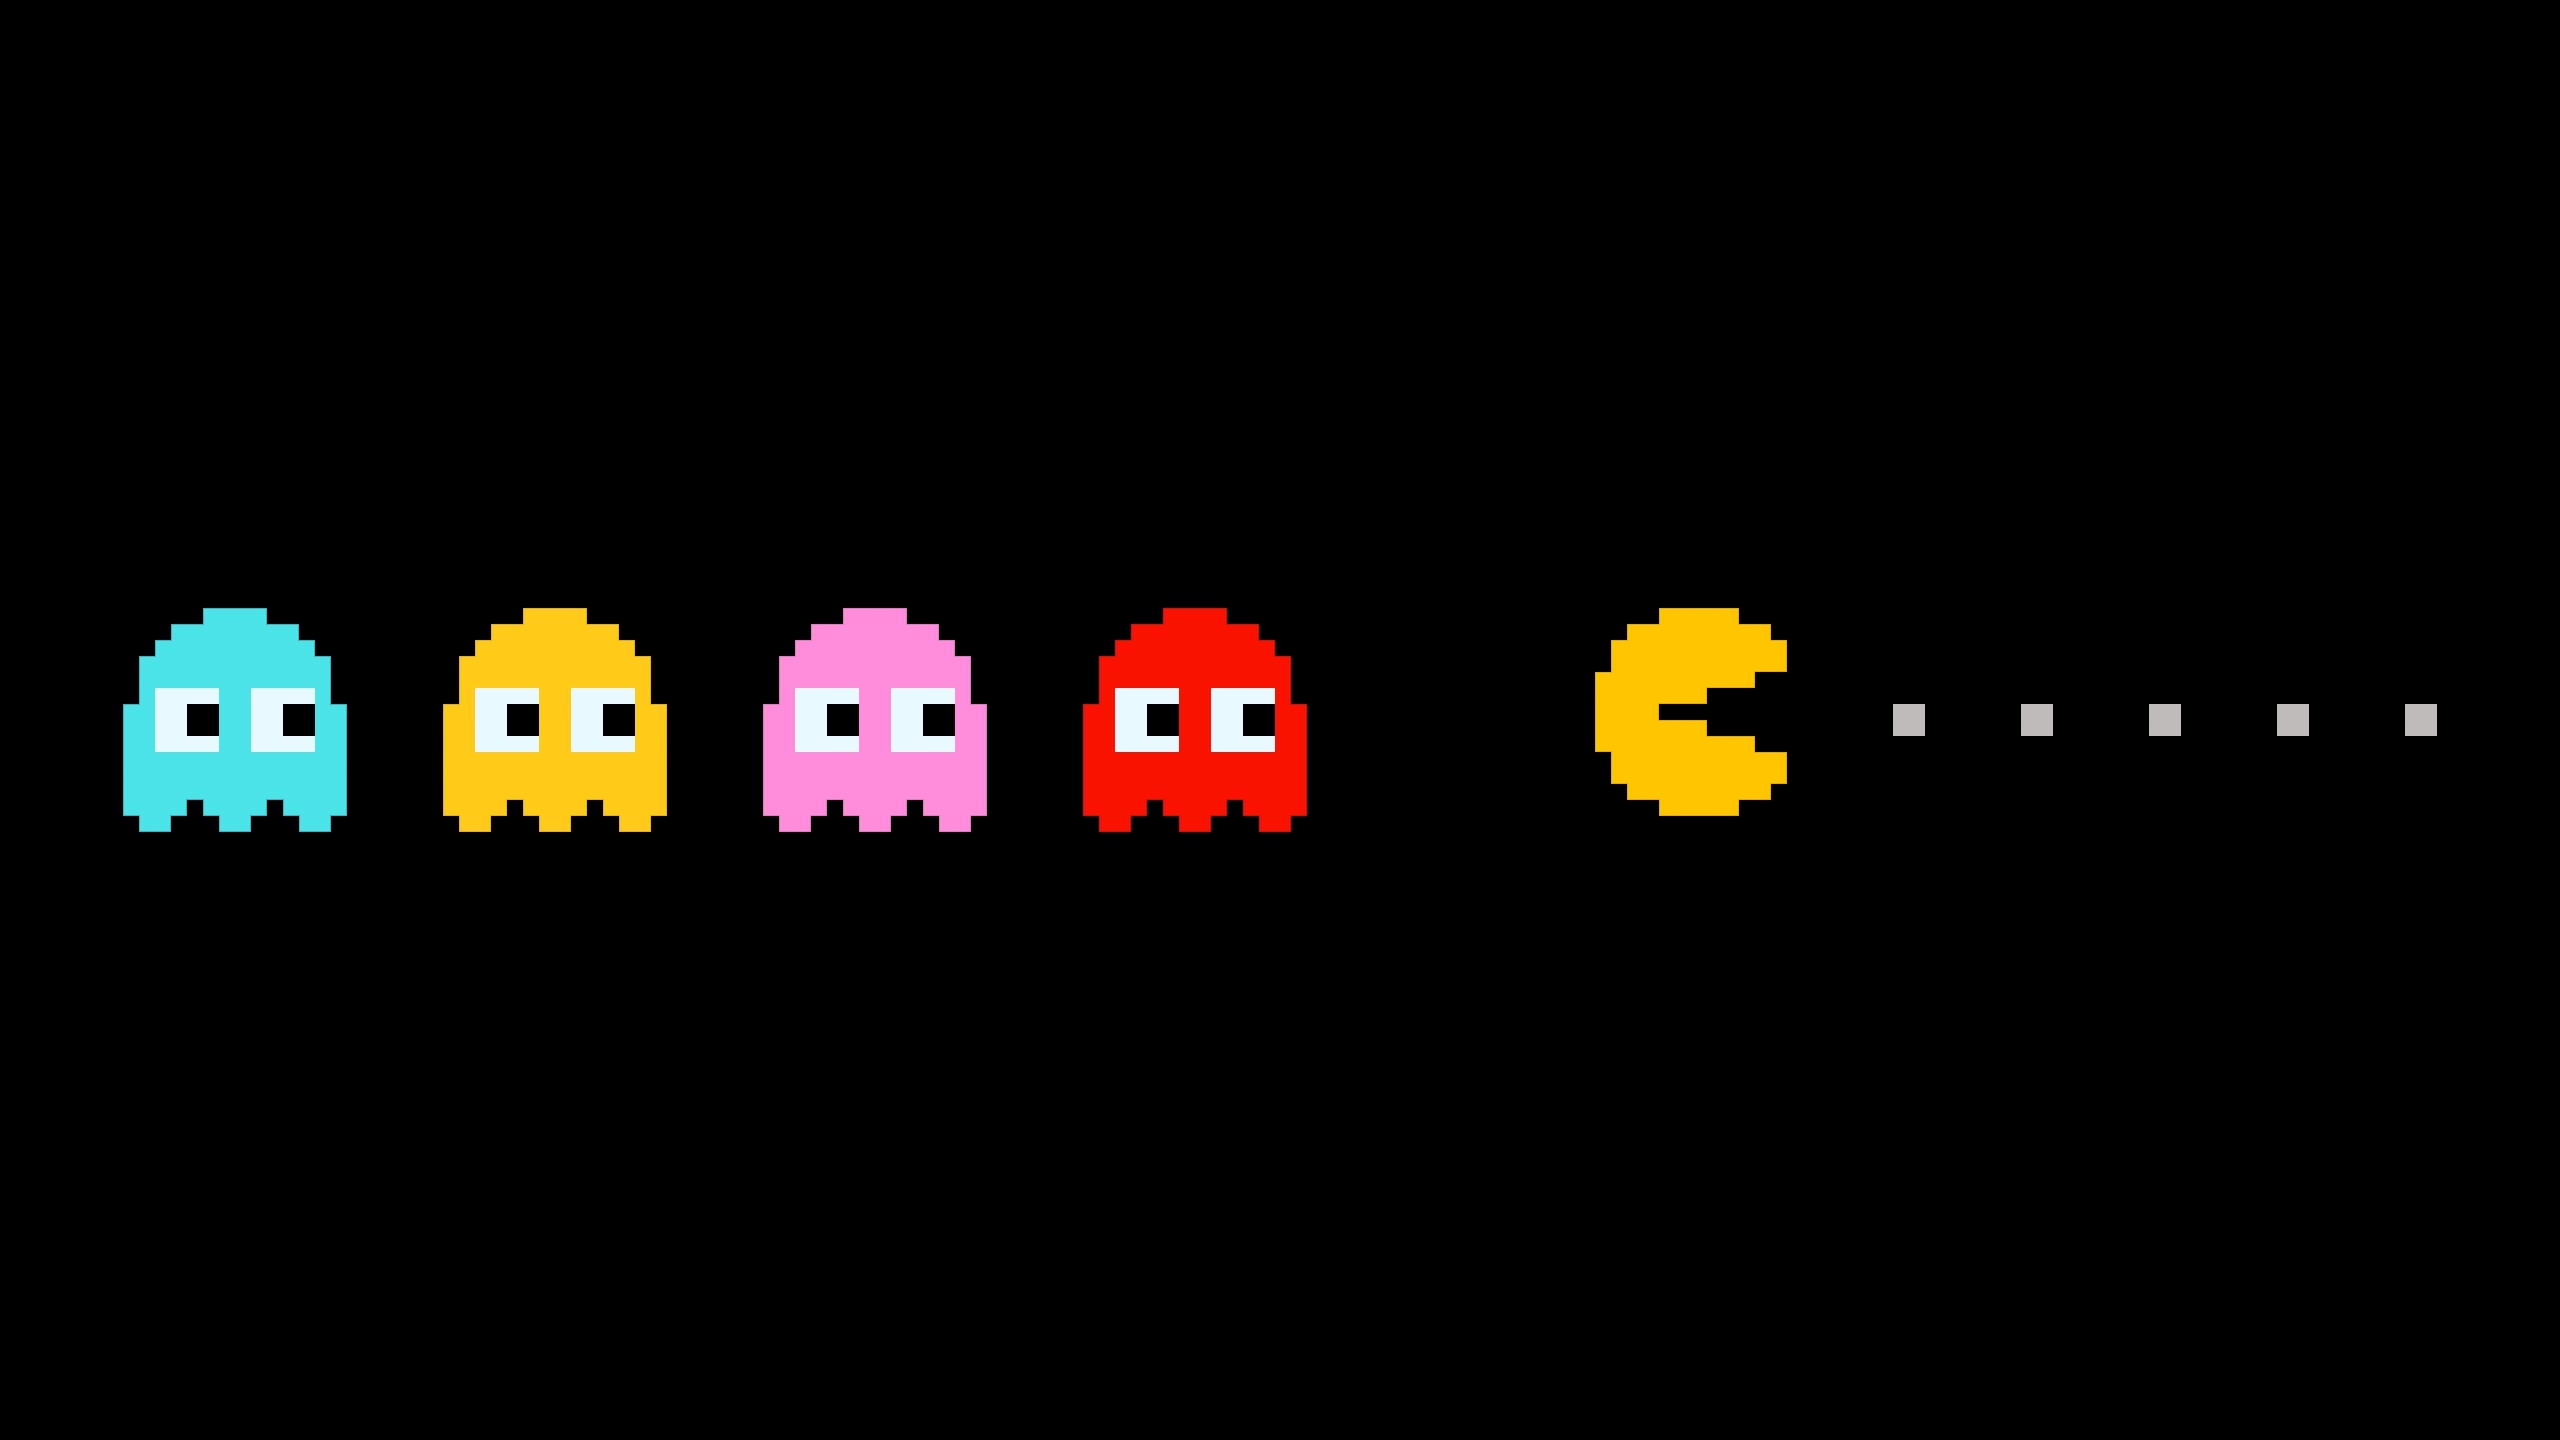 Pacman Games Wallpaper HD For Desktop | WALLSISTAH.COM